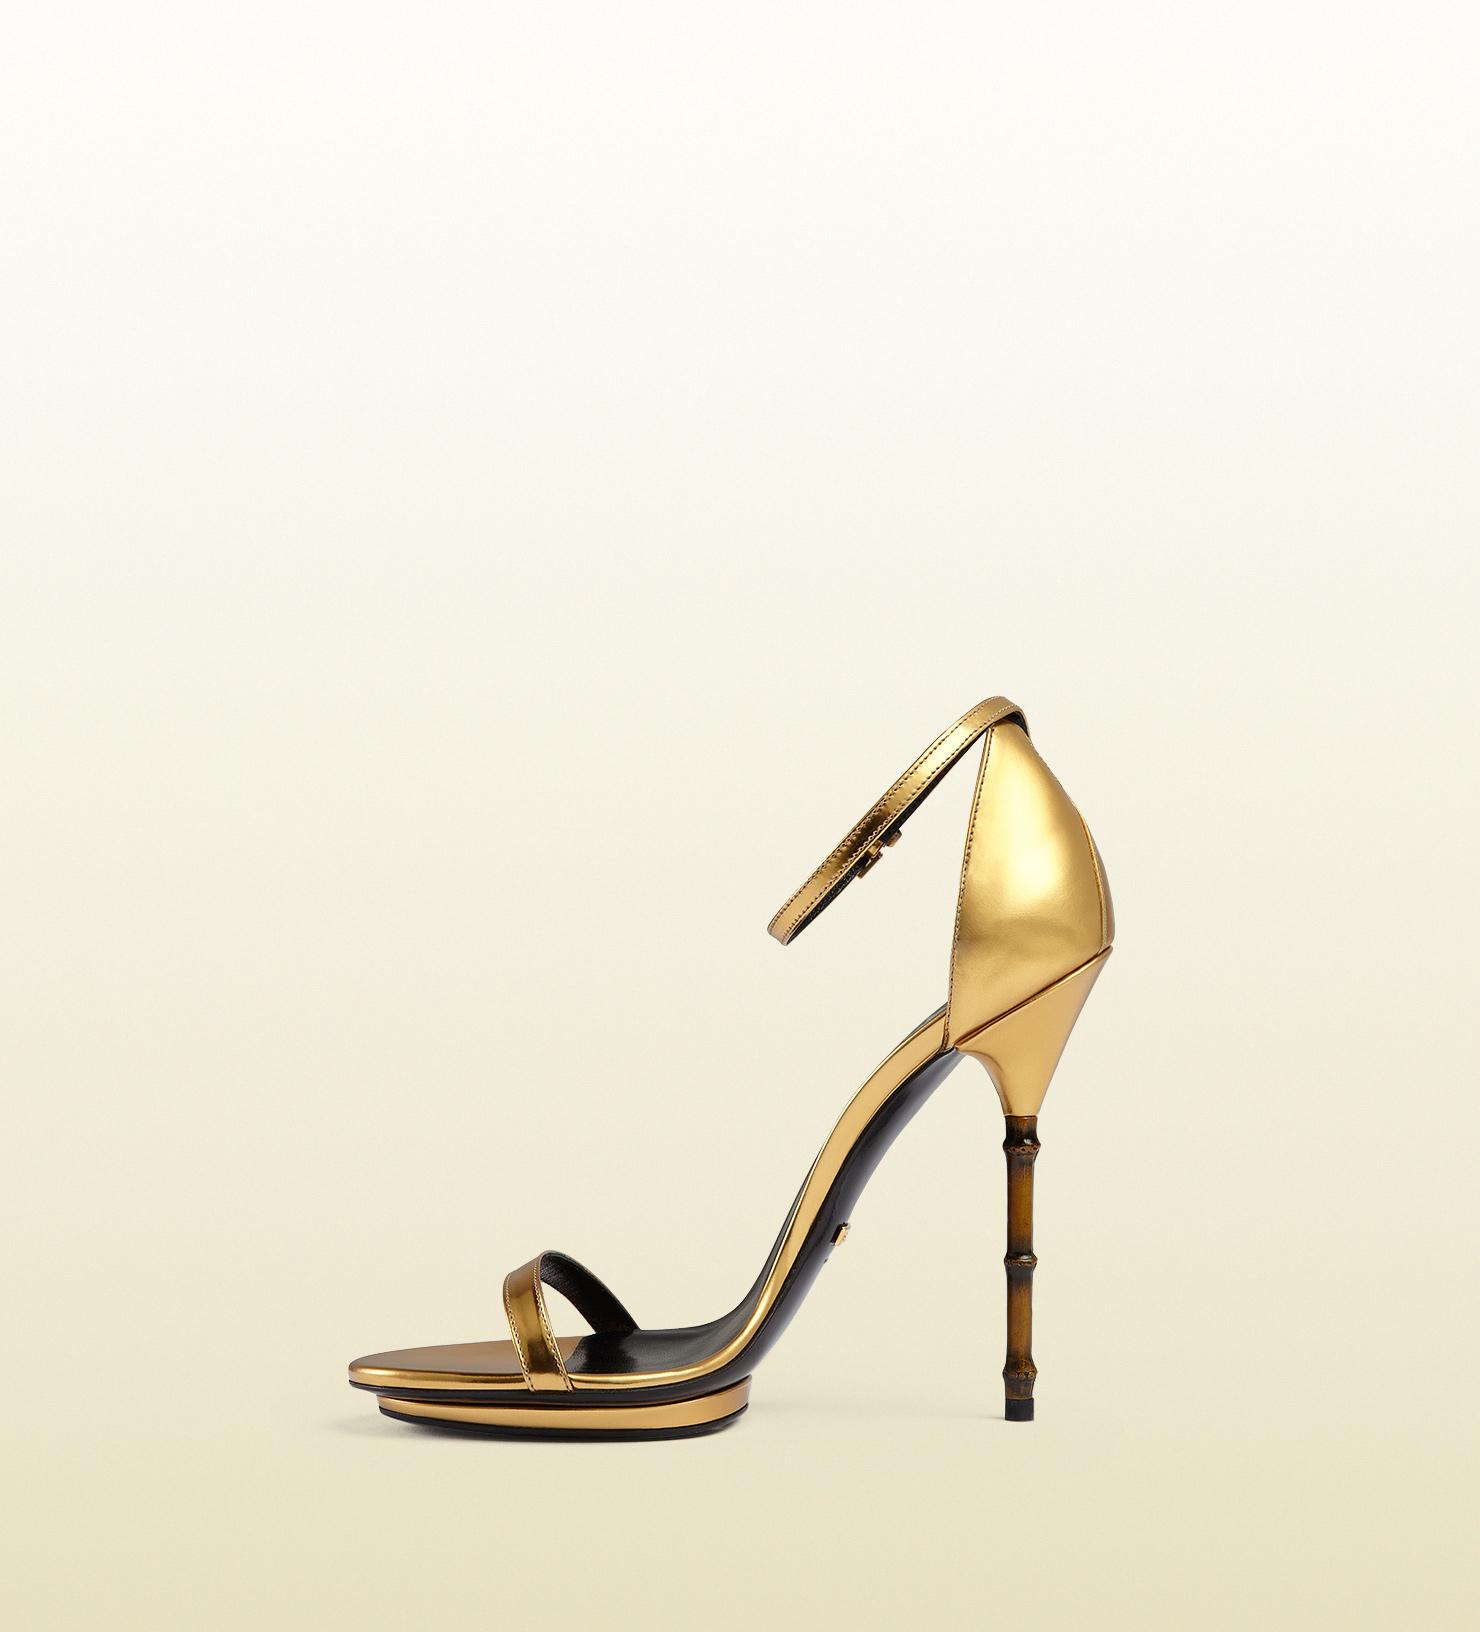 33dbaae08a1 Lyst - Gucci Metallic Leather Sandal With Bamboo Shaped Heel in Metallic